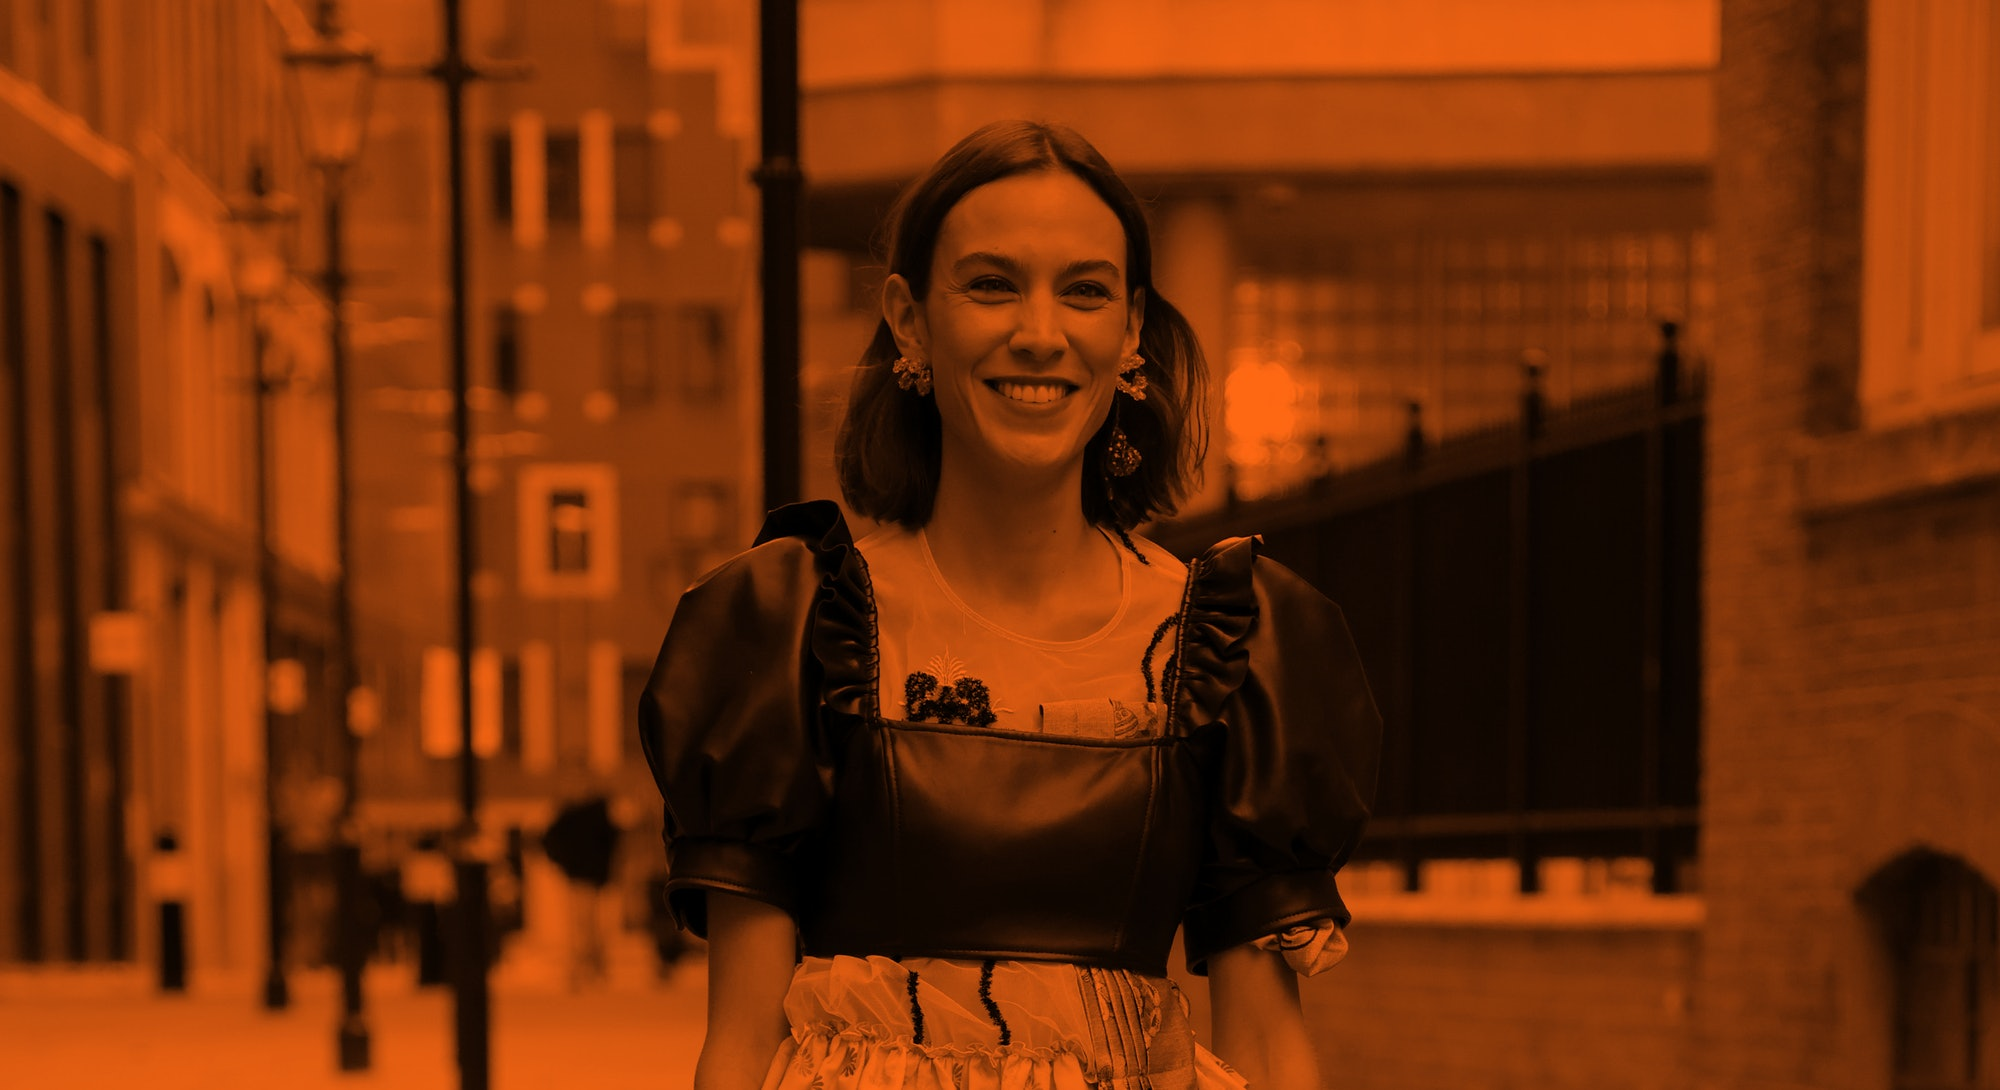 LONDON, ENGLAND - SEPTEMBER 20: Alexa Chung attends Simone Rocha at St Bartholomew's Hospital during...